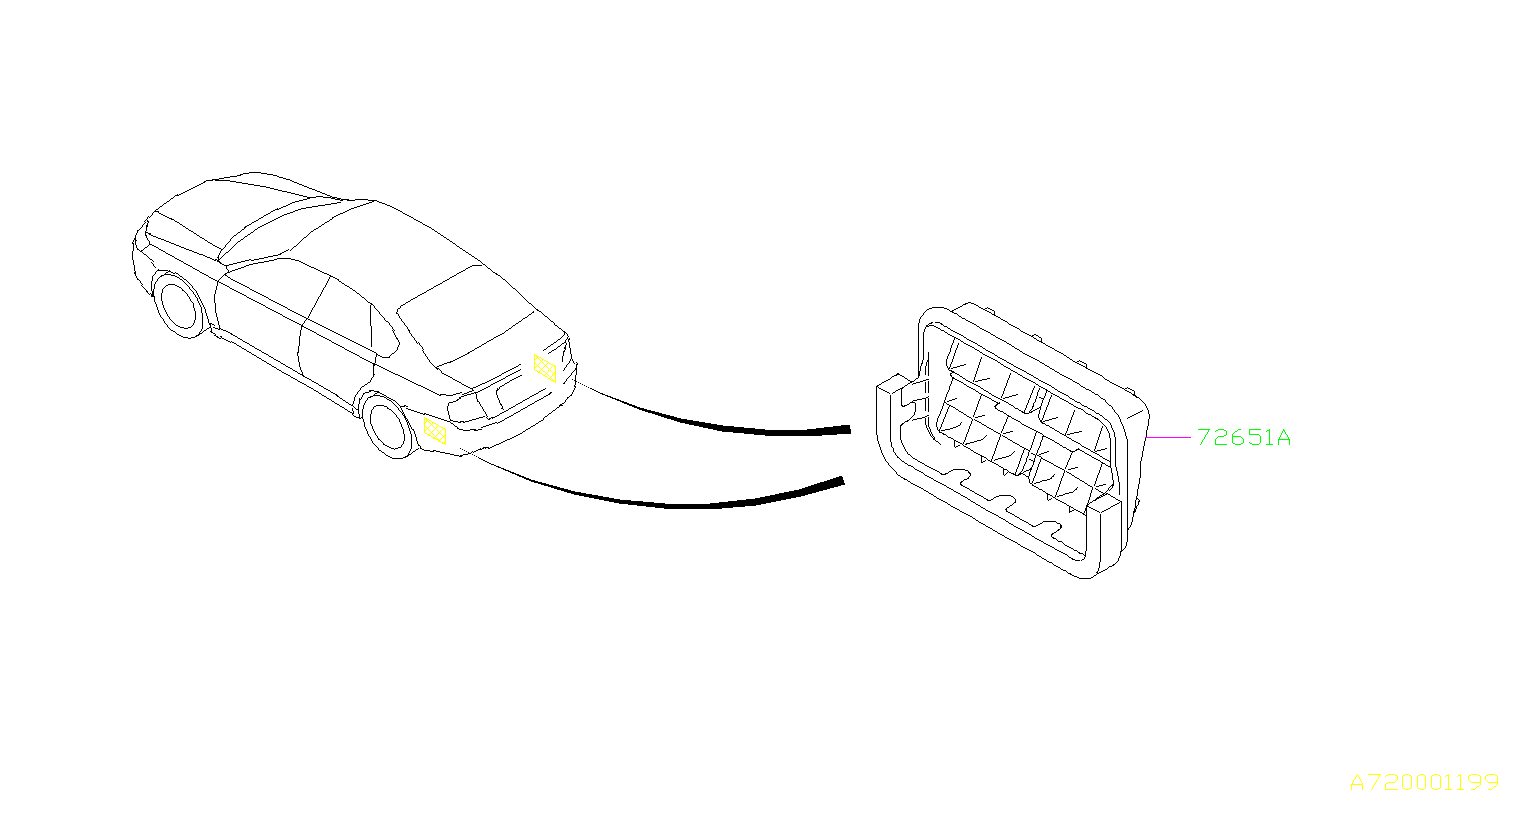 Subaru Outback Quarter Panel Air Vent Grille. SYSTEM